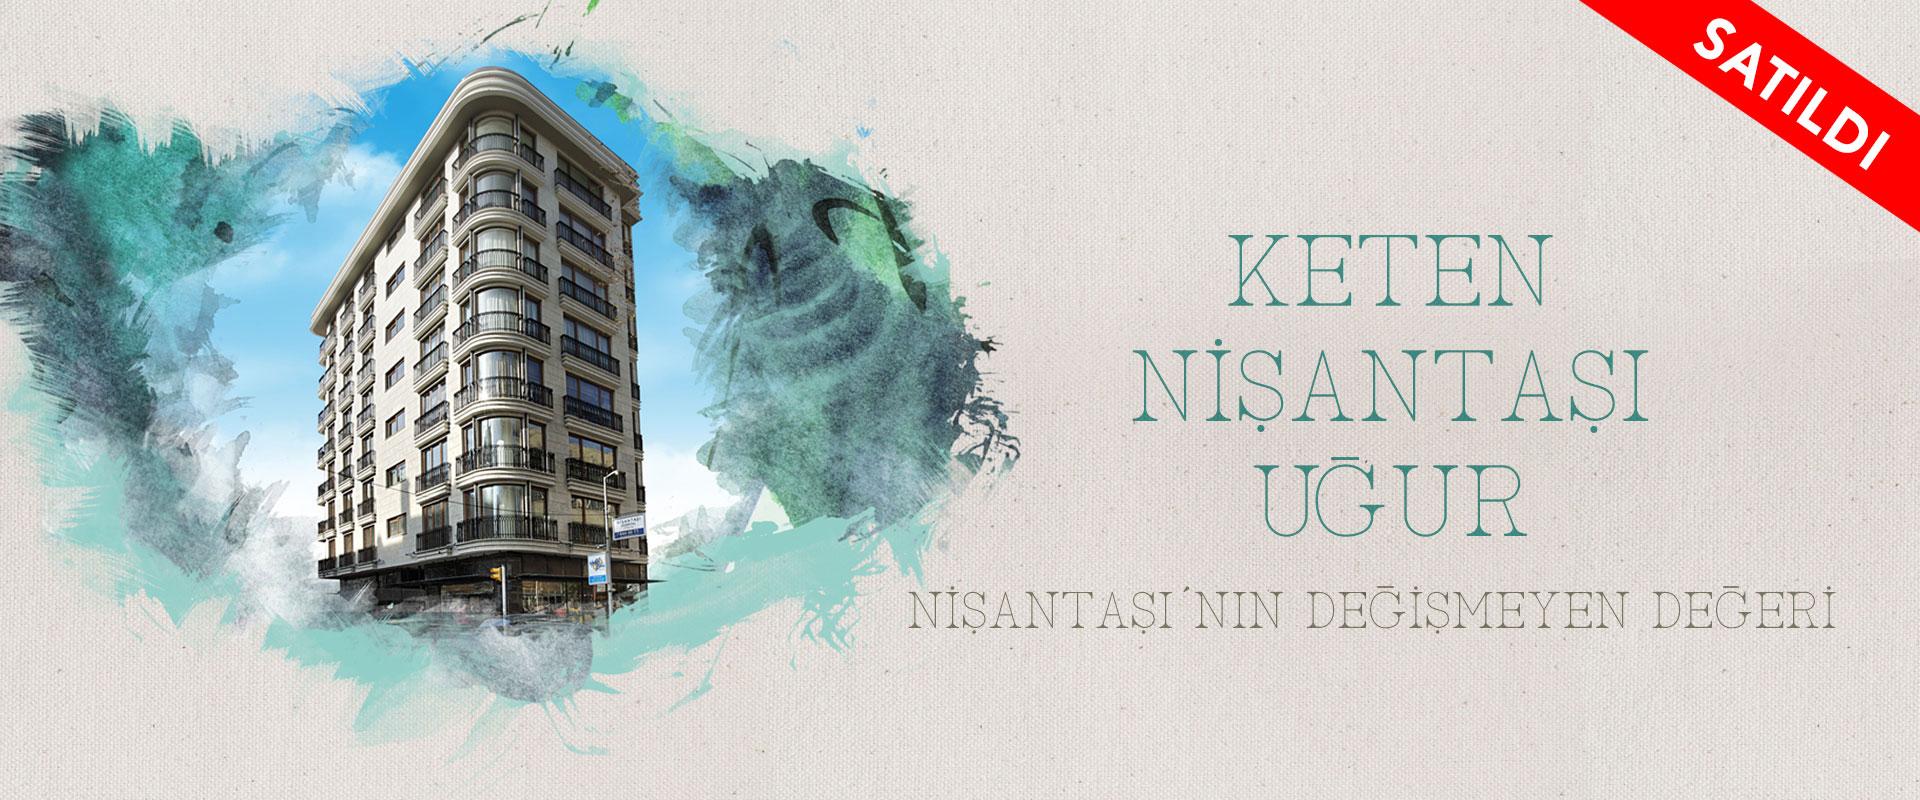 ket443_nisantasi_ugur_satildi